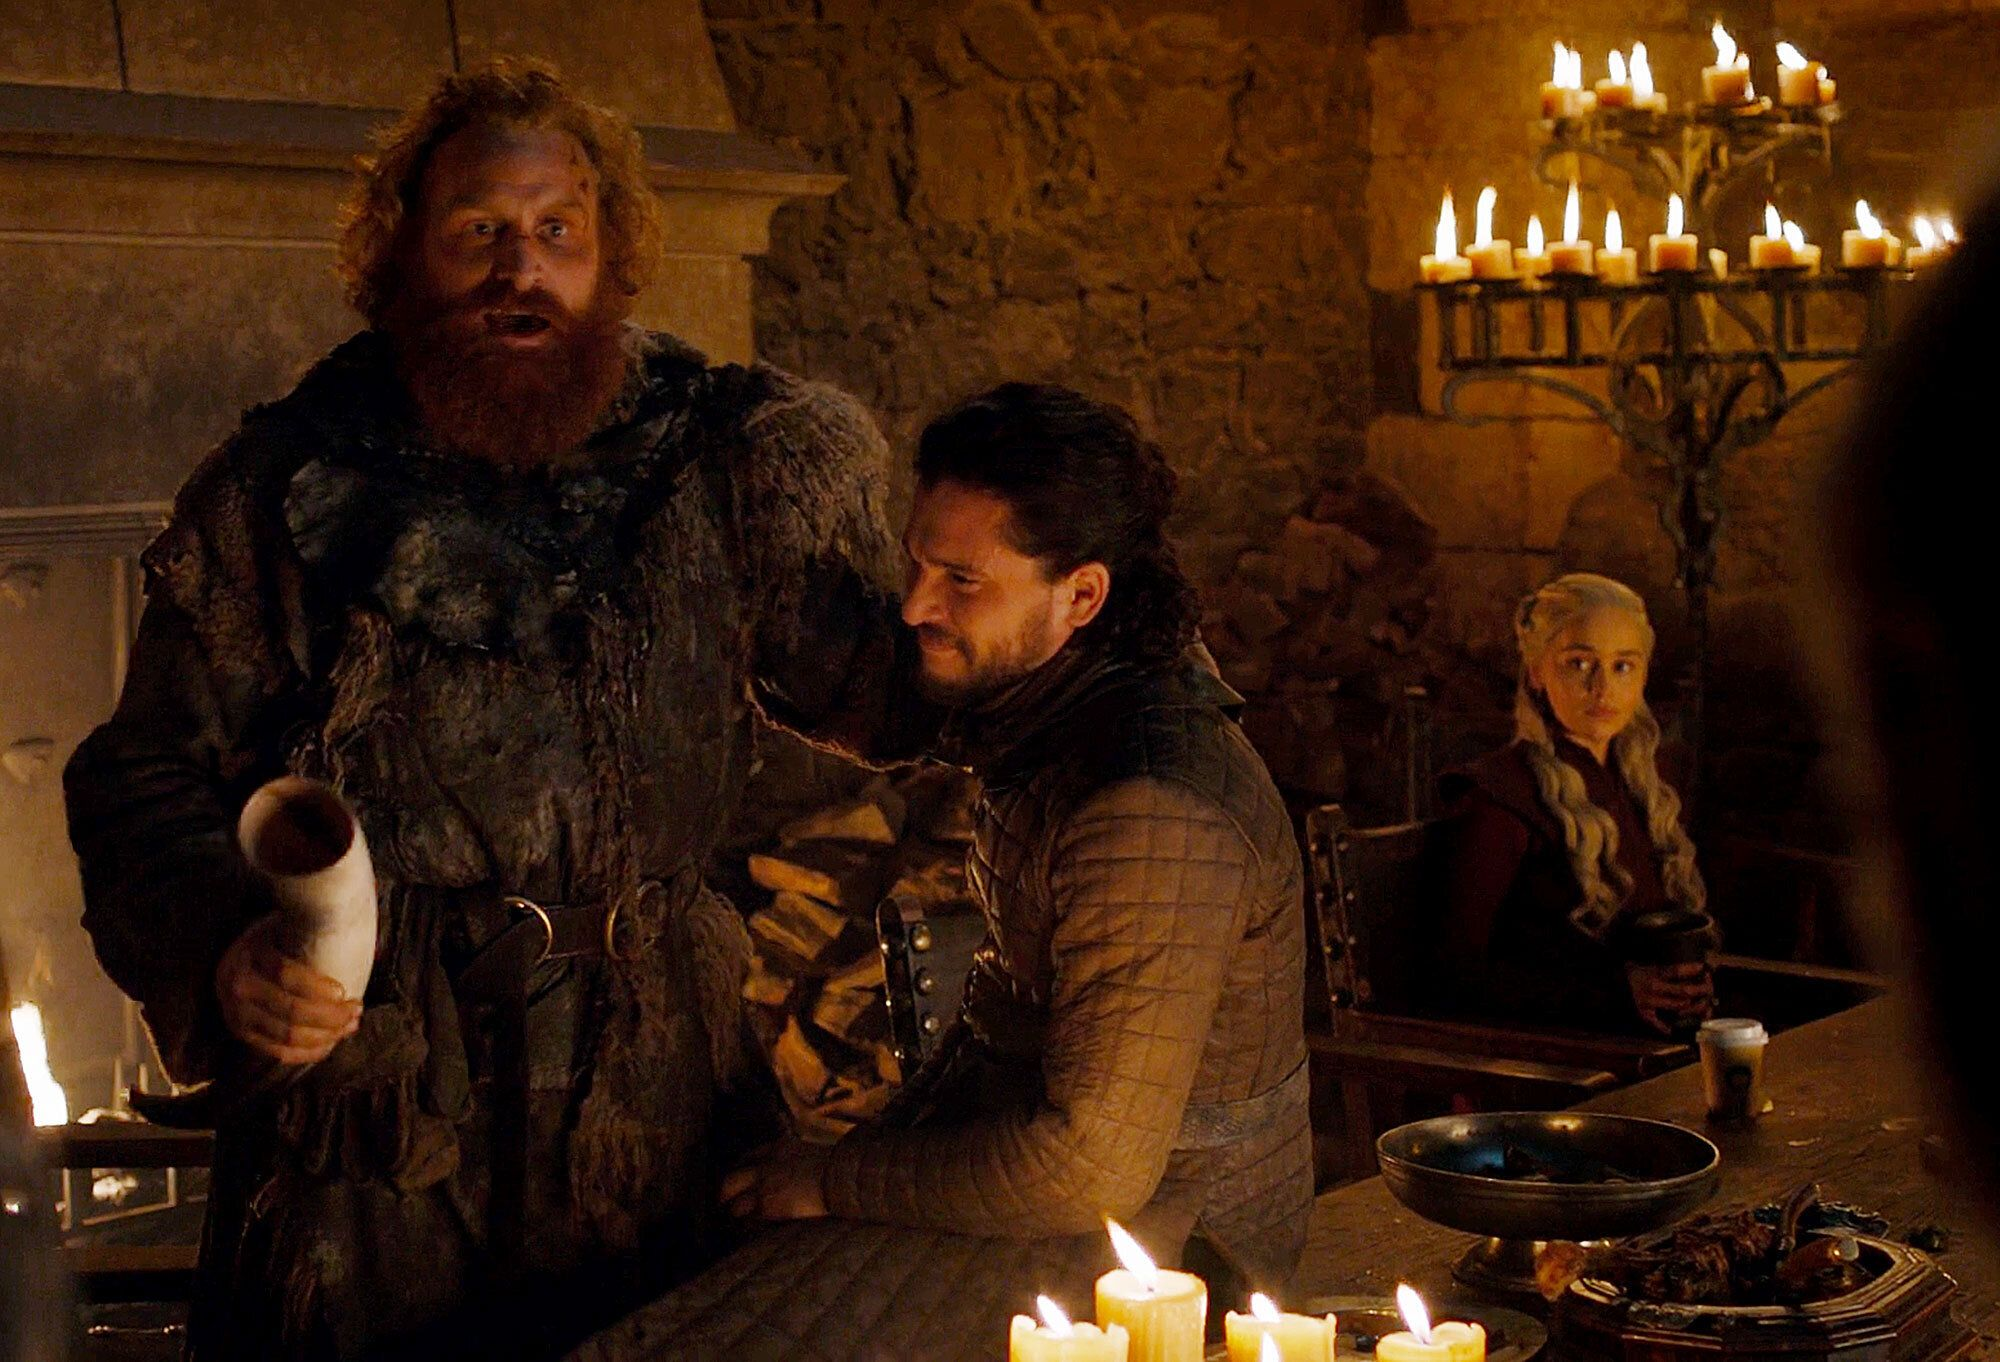 «Game of Thrones»: HBO reconnaît avec humour l'erreur du